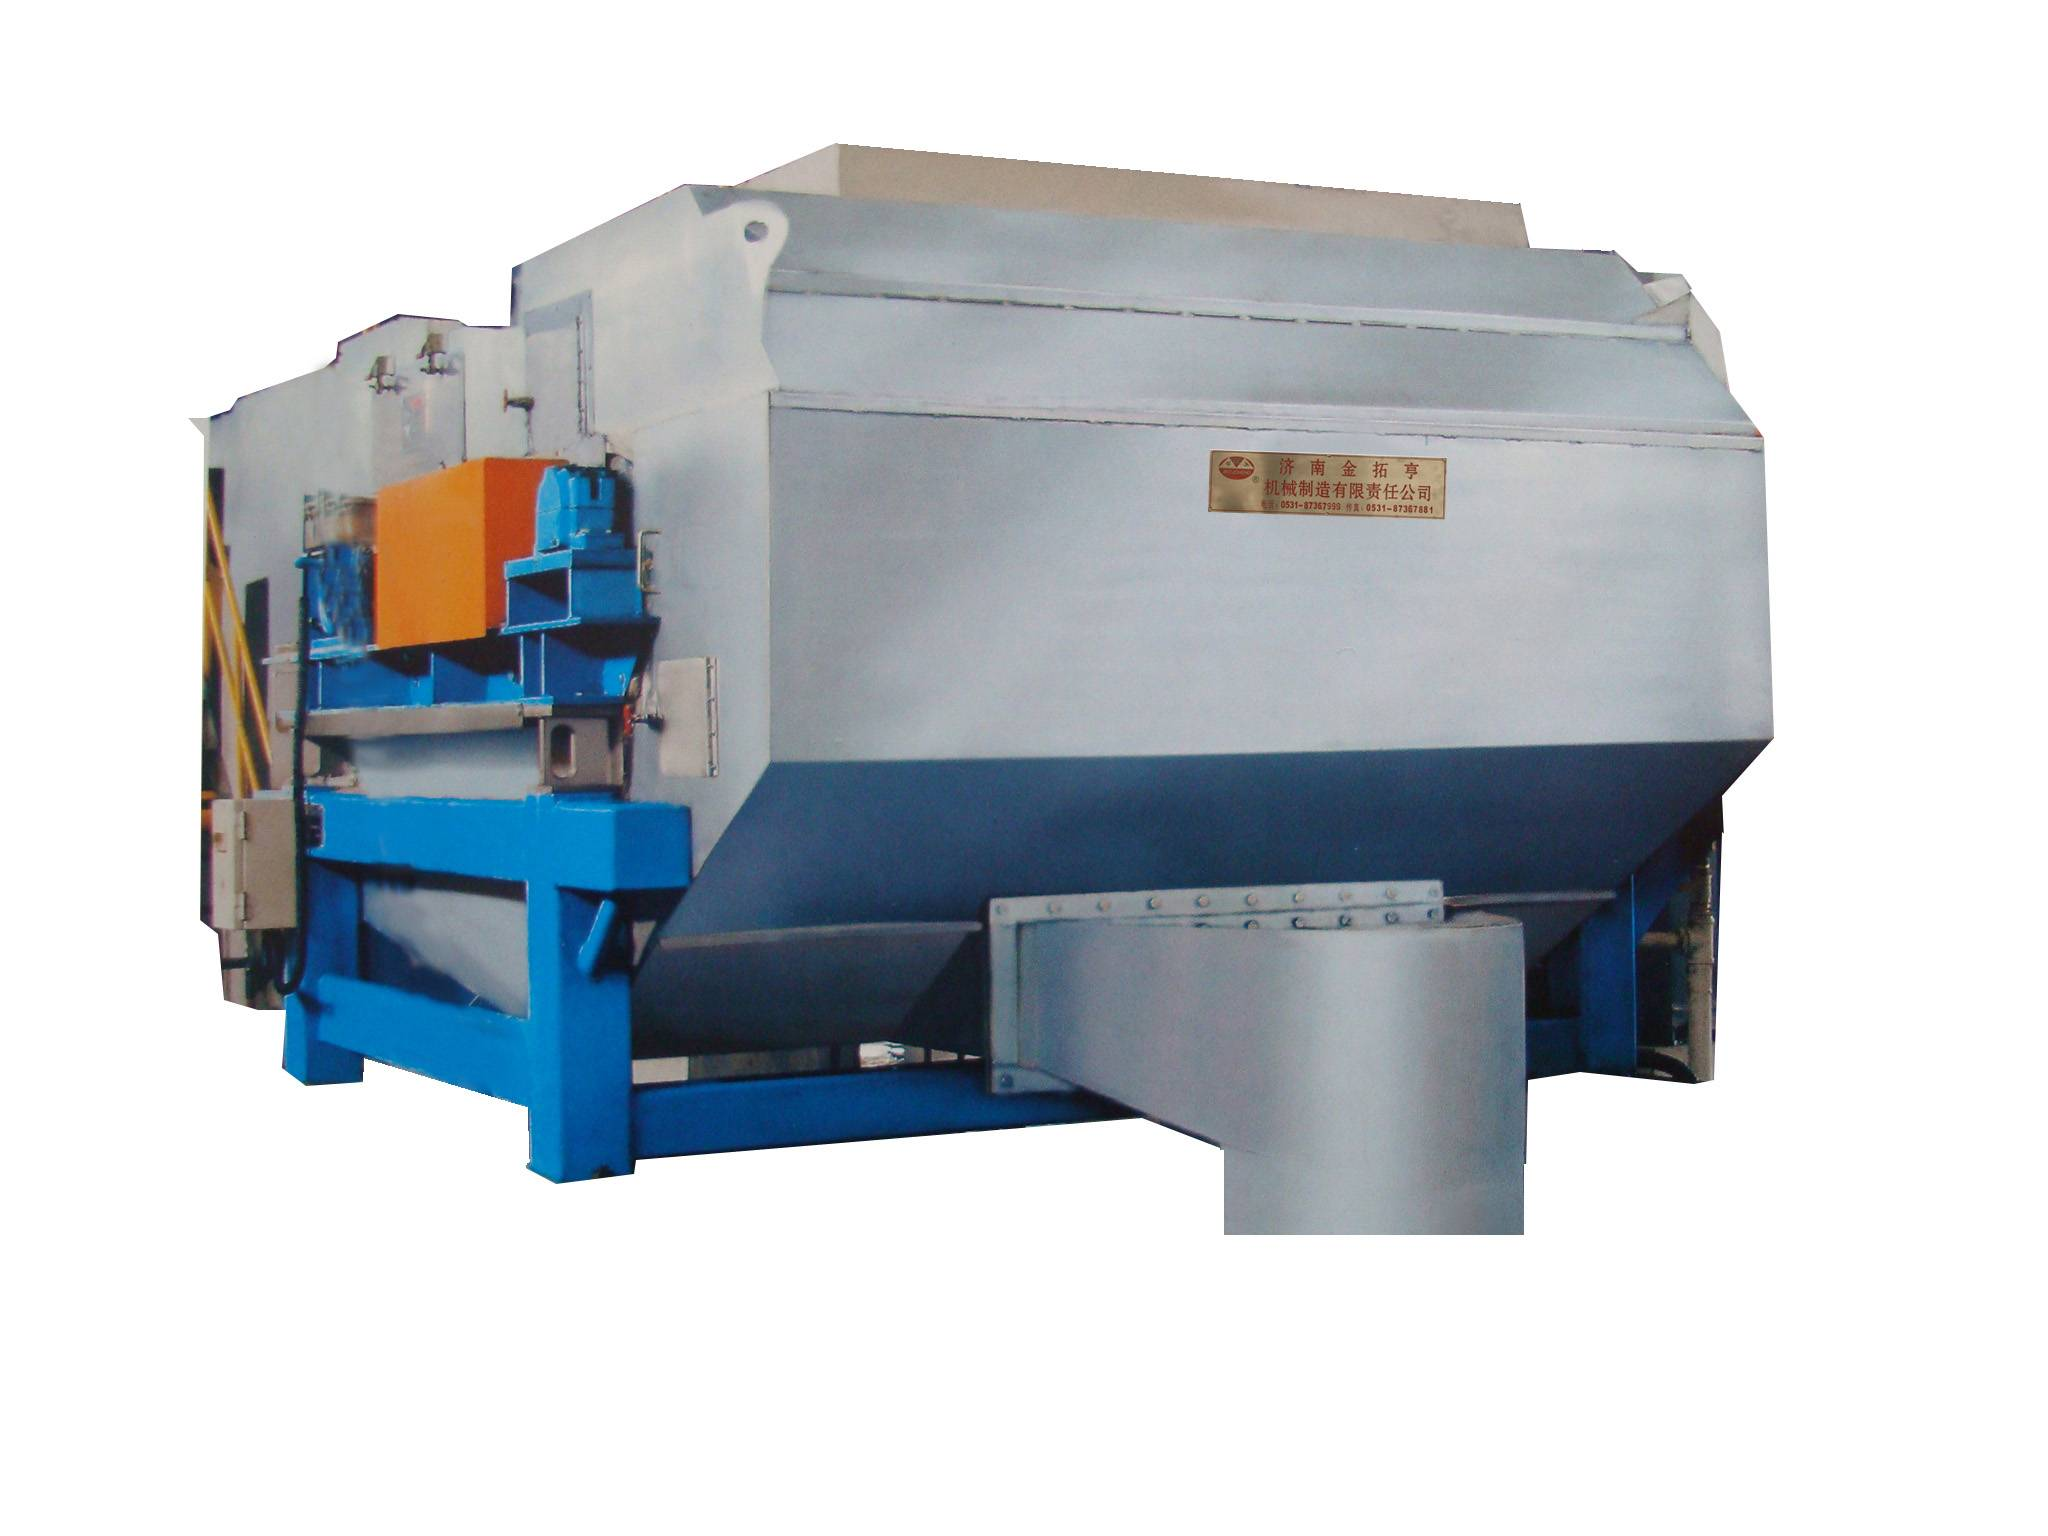 pulp equipment